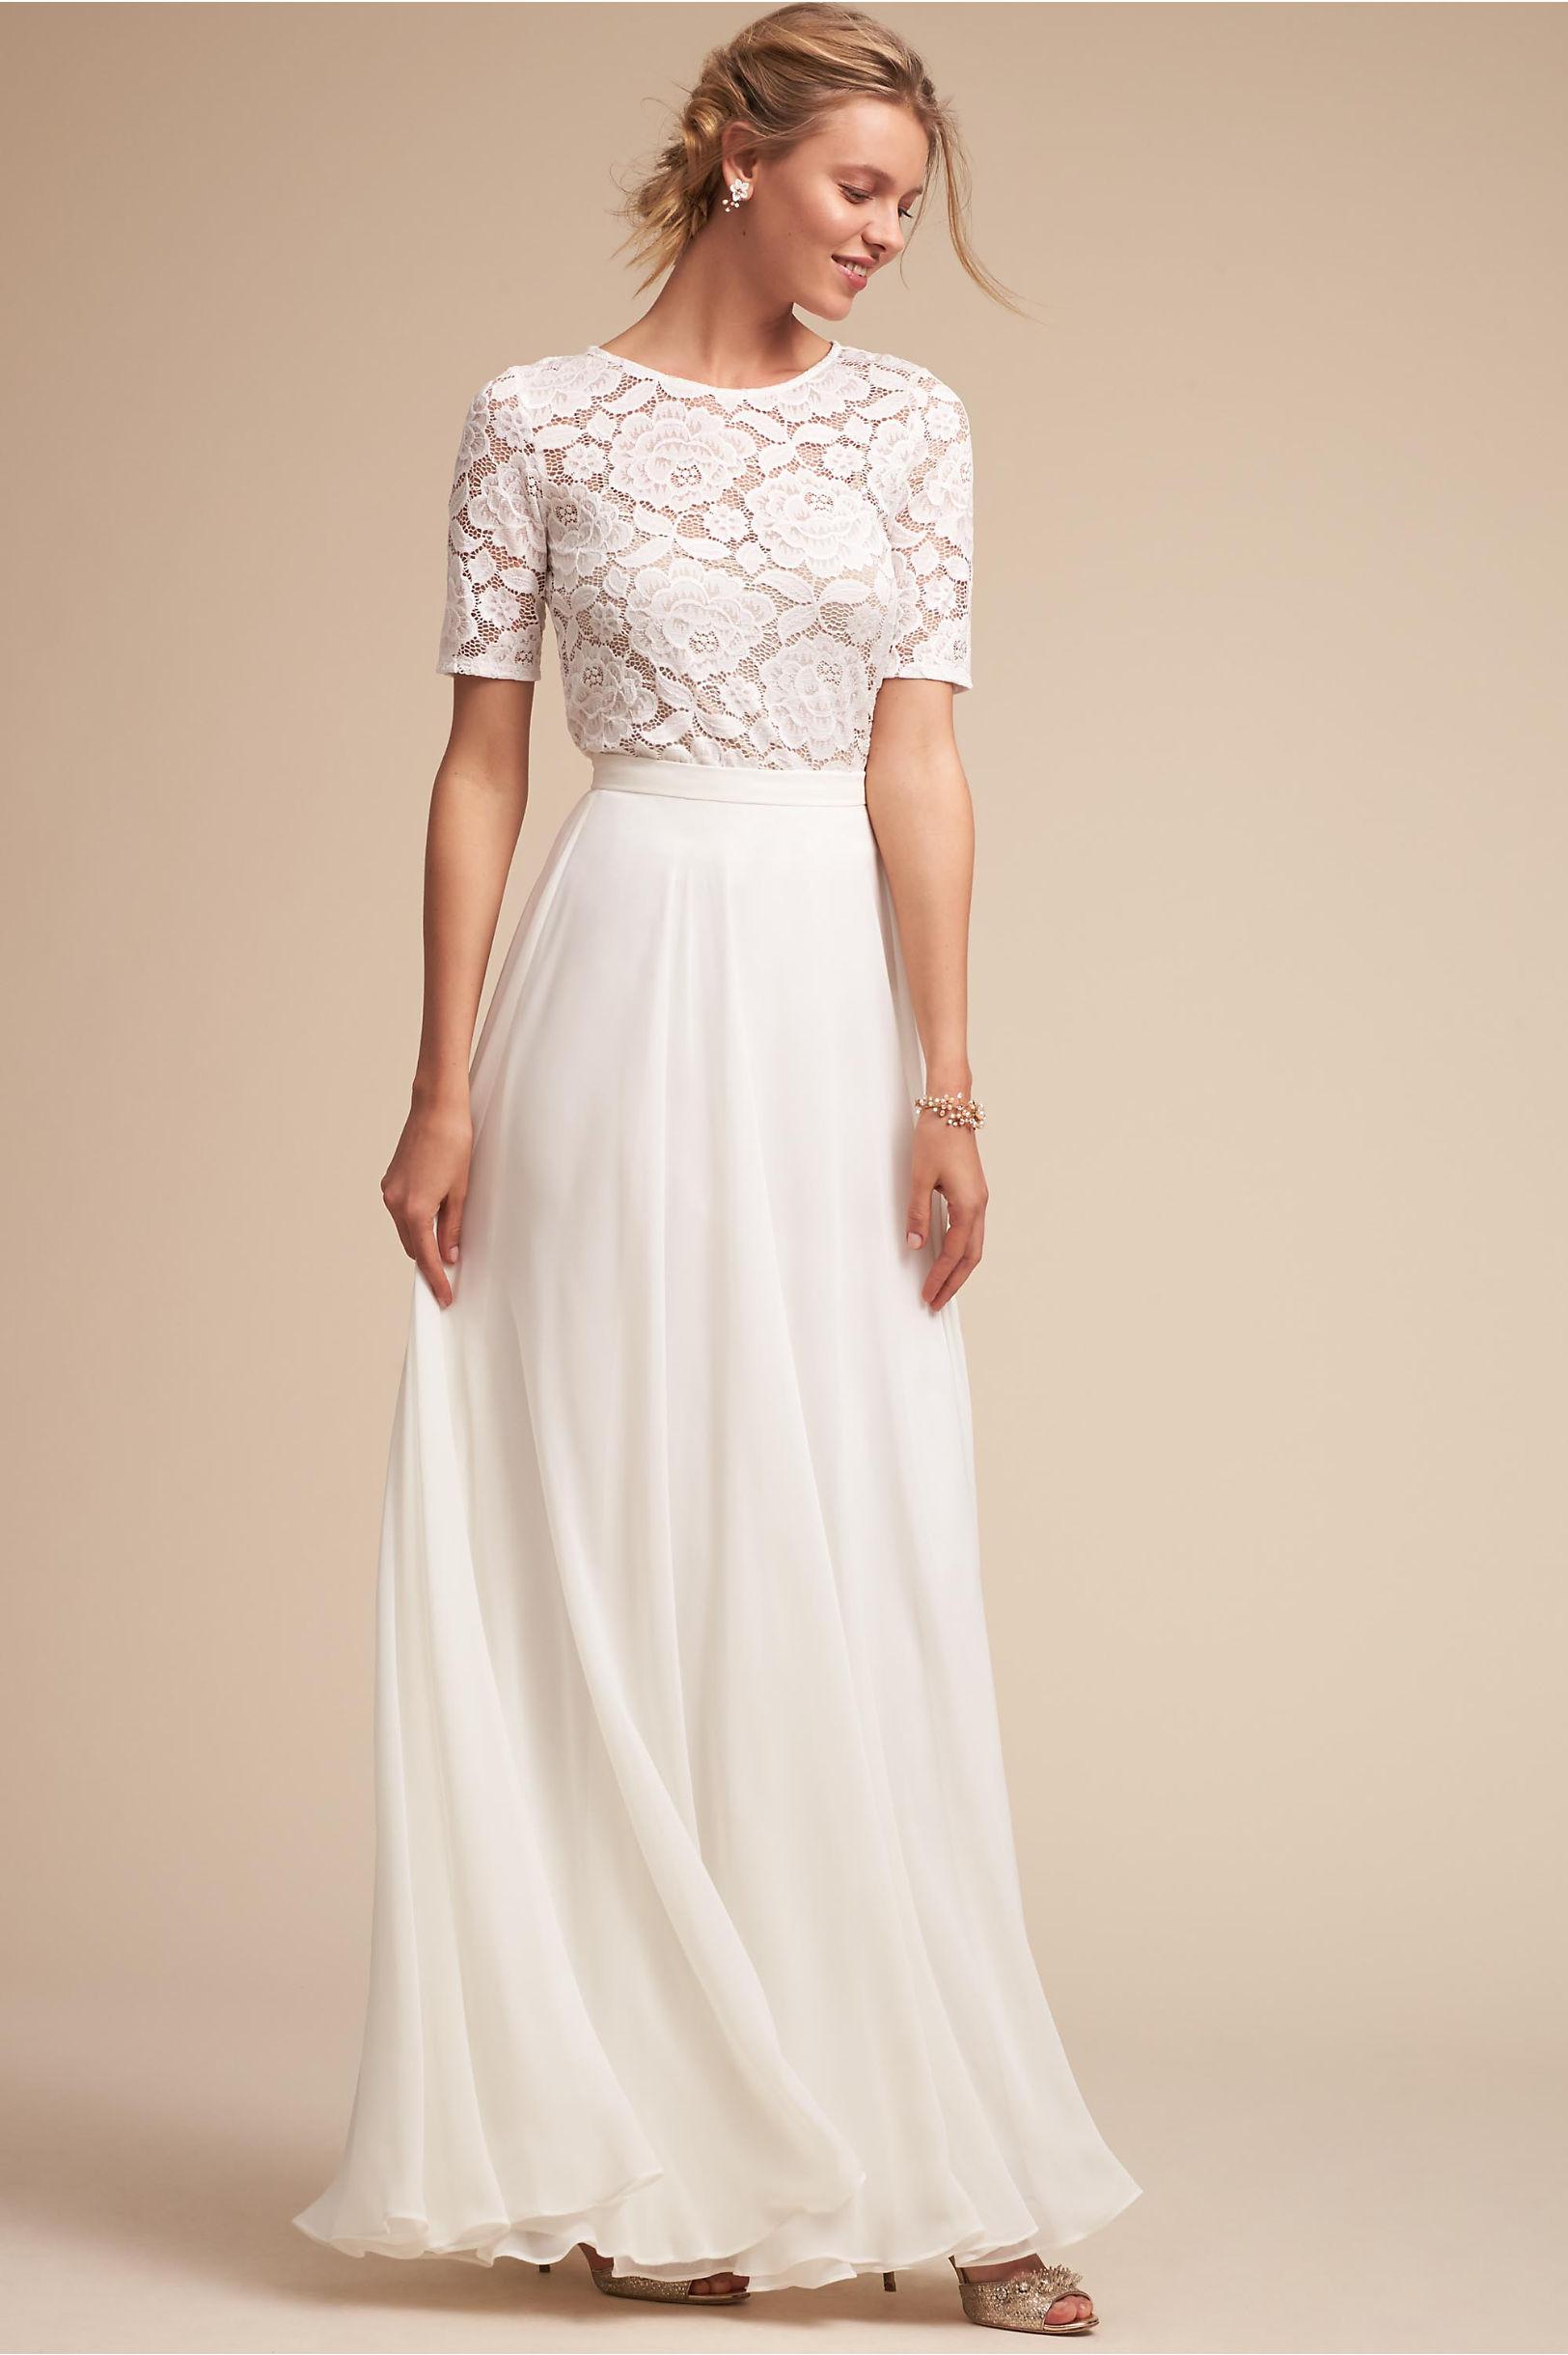 Lace bridesmaid dresses long short styles bhldn jive top hampton skirt ombrellifo Choice Image